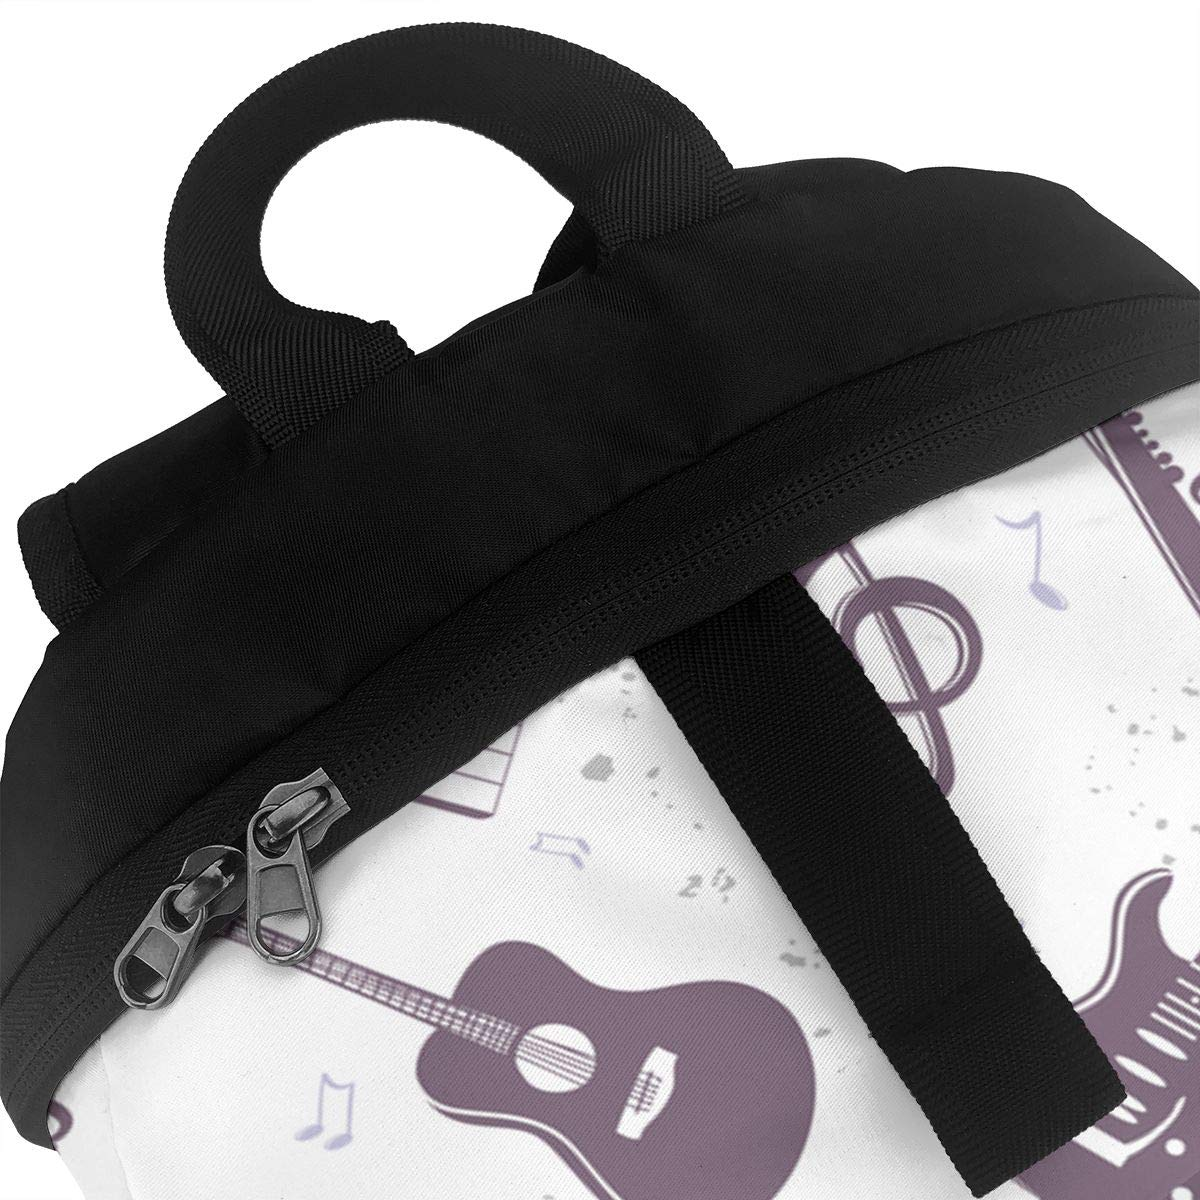 23a6f4713805 Amazon.com : Liumong Silhouette Musical Instruments Book Bag Holder ...